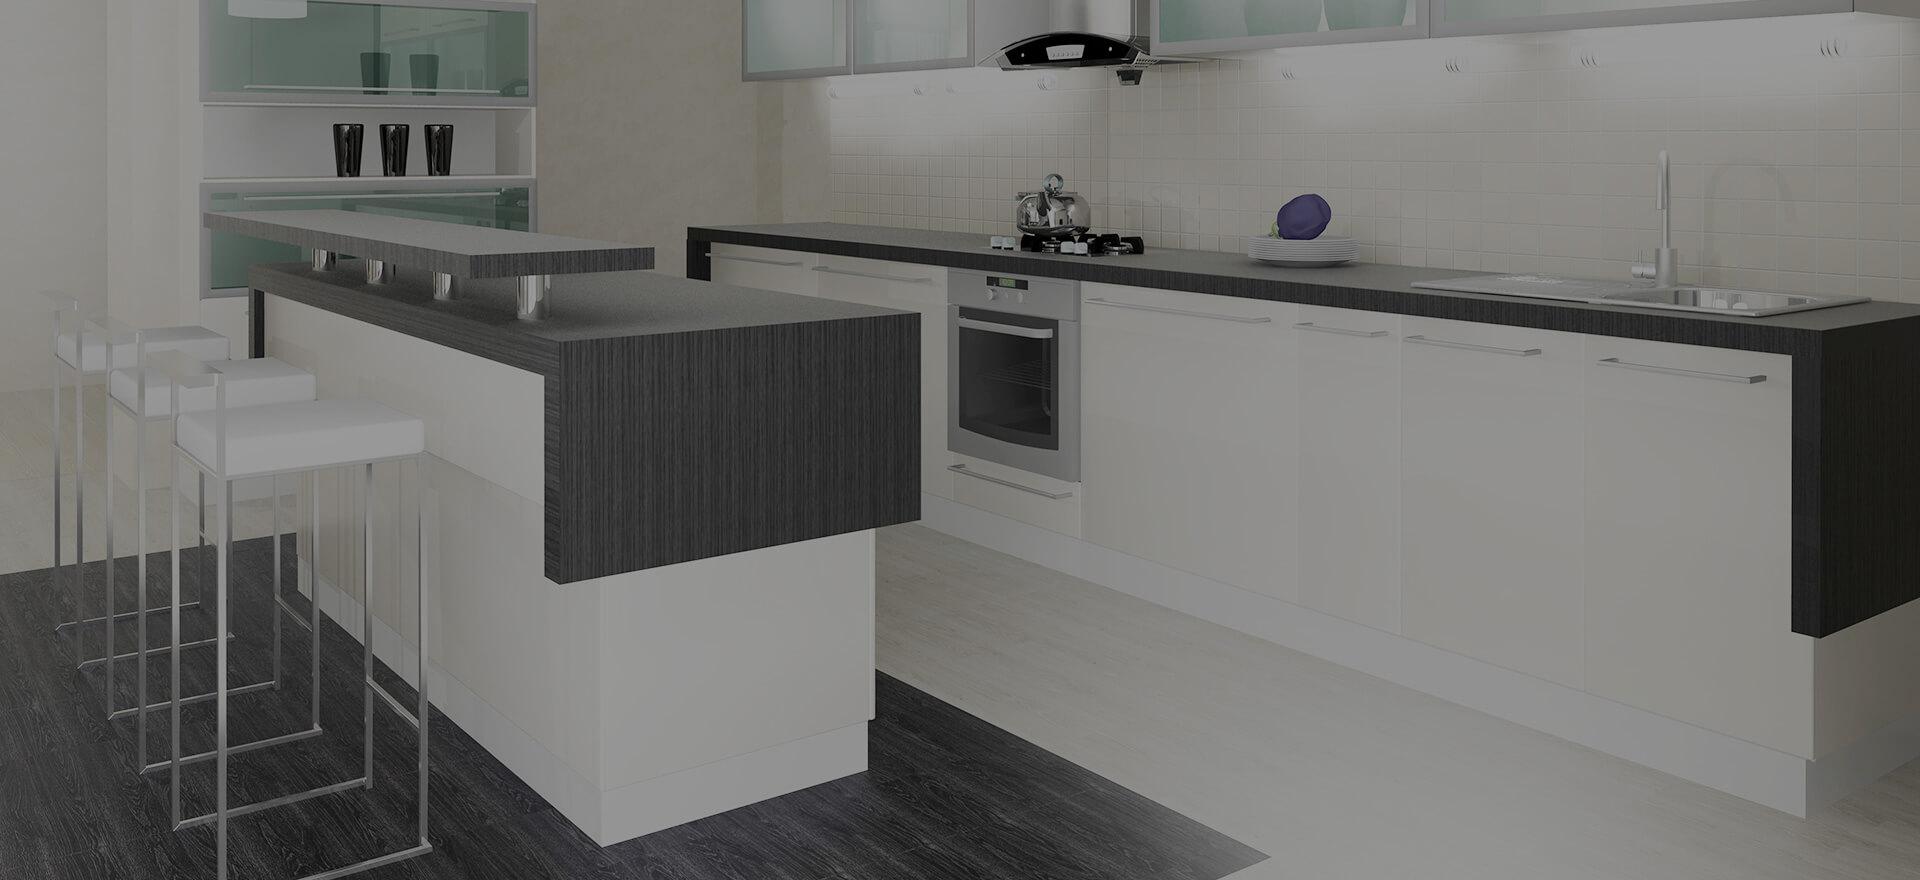 Kitchen Remodeling San Jose Ca 408 819 2116 Free Quote